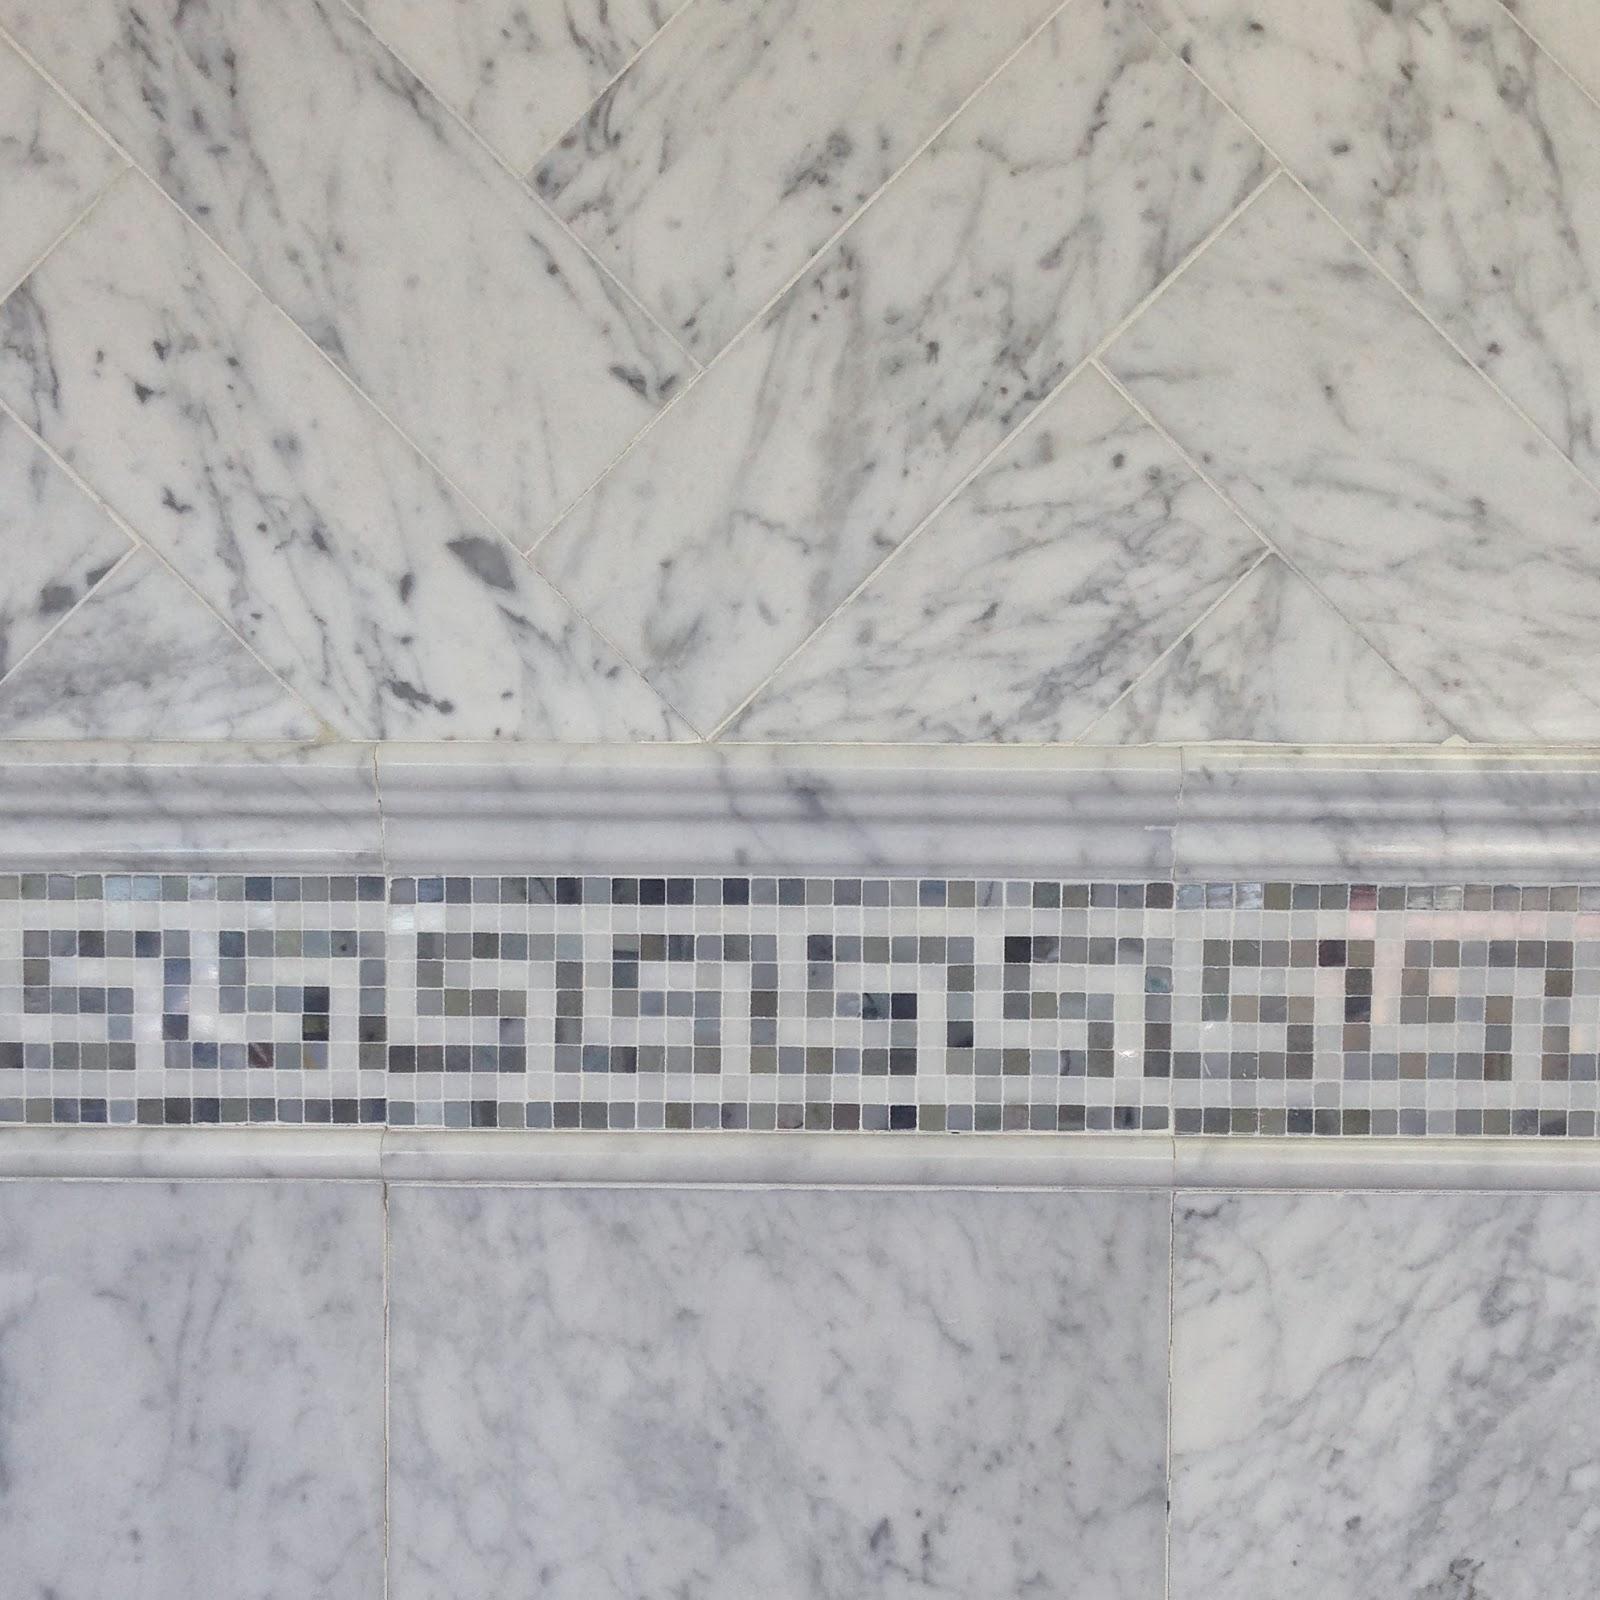 6 12 Bianco Carrara Marble Tile With Greek Key Border And 24